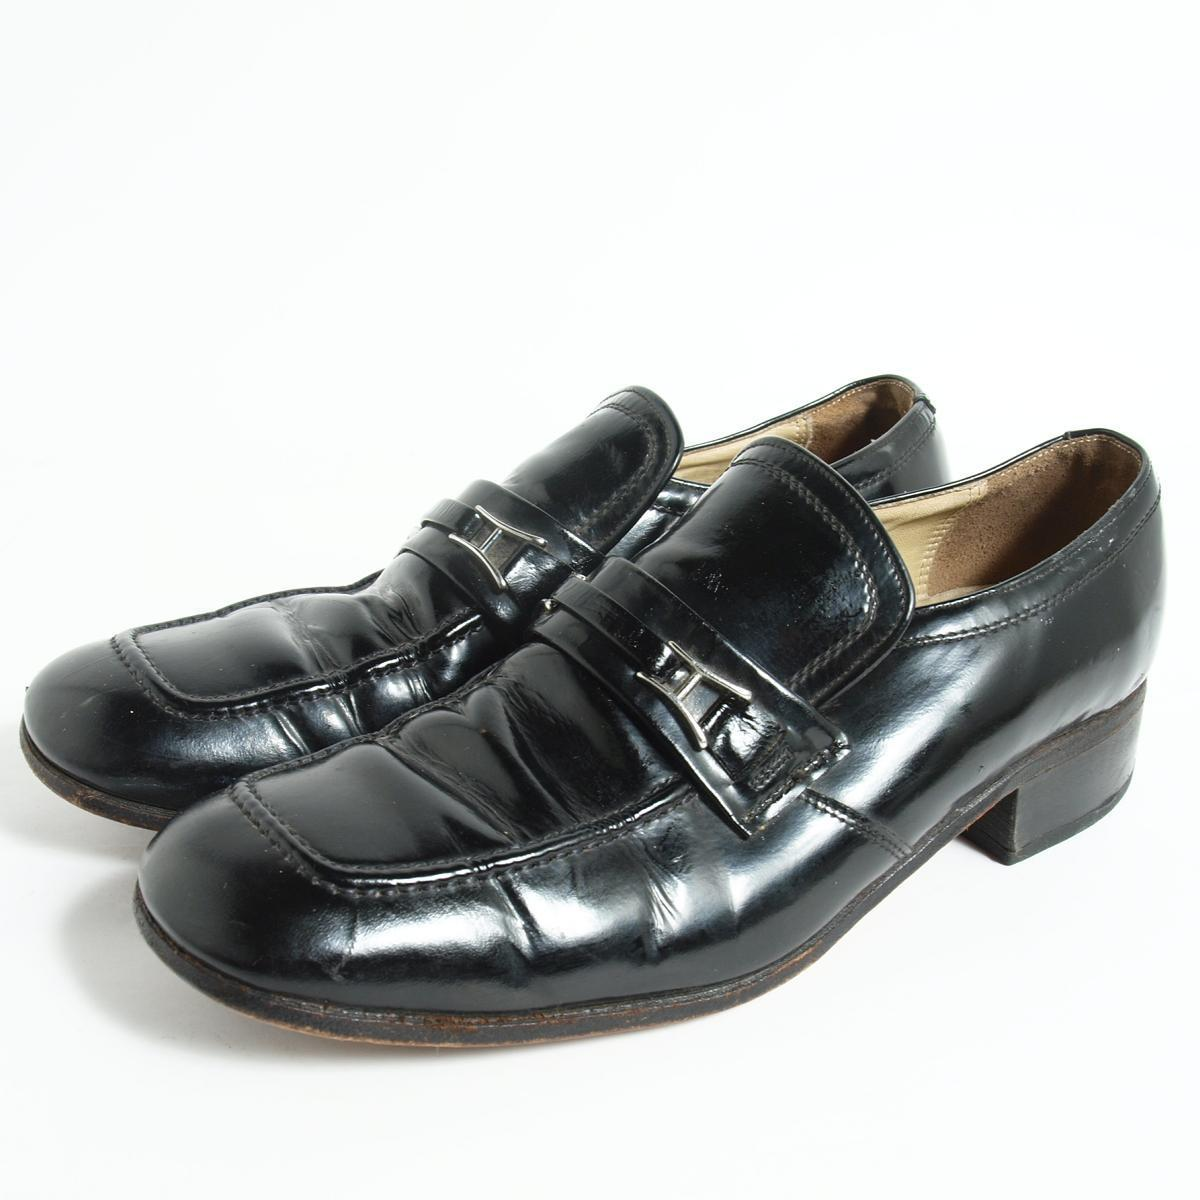 fcf35c198cb VINTAGE CLOTHING JAM  Town craft JCPENNEY S bit loafer 9.5D men 27.5 ...